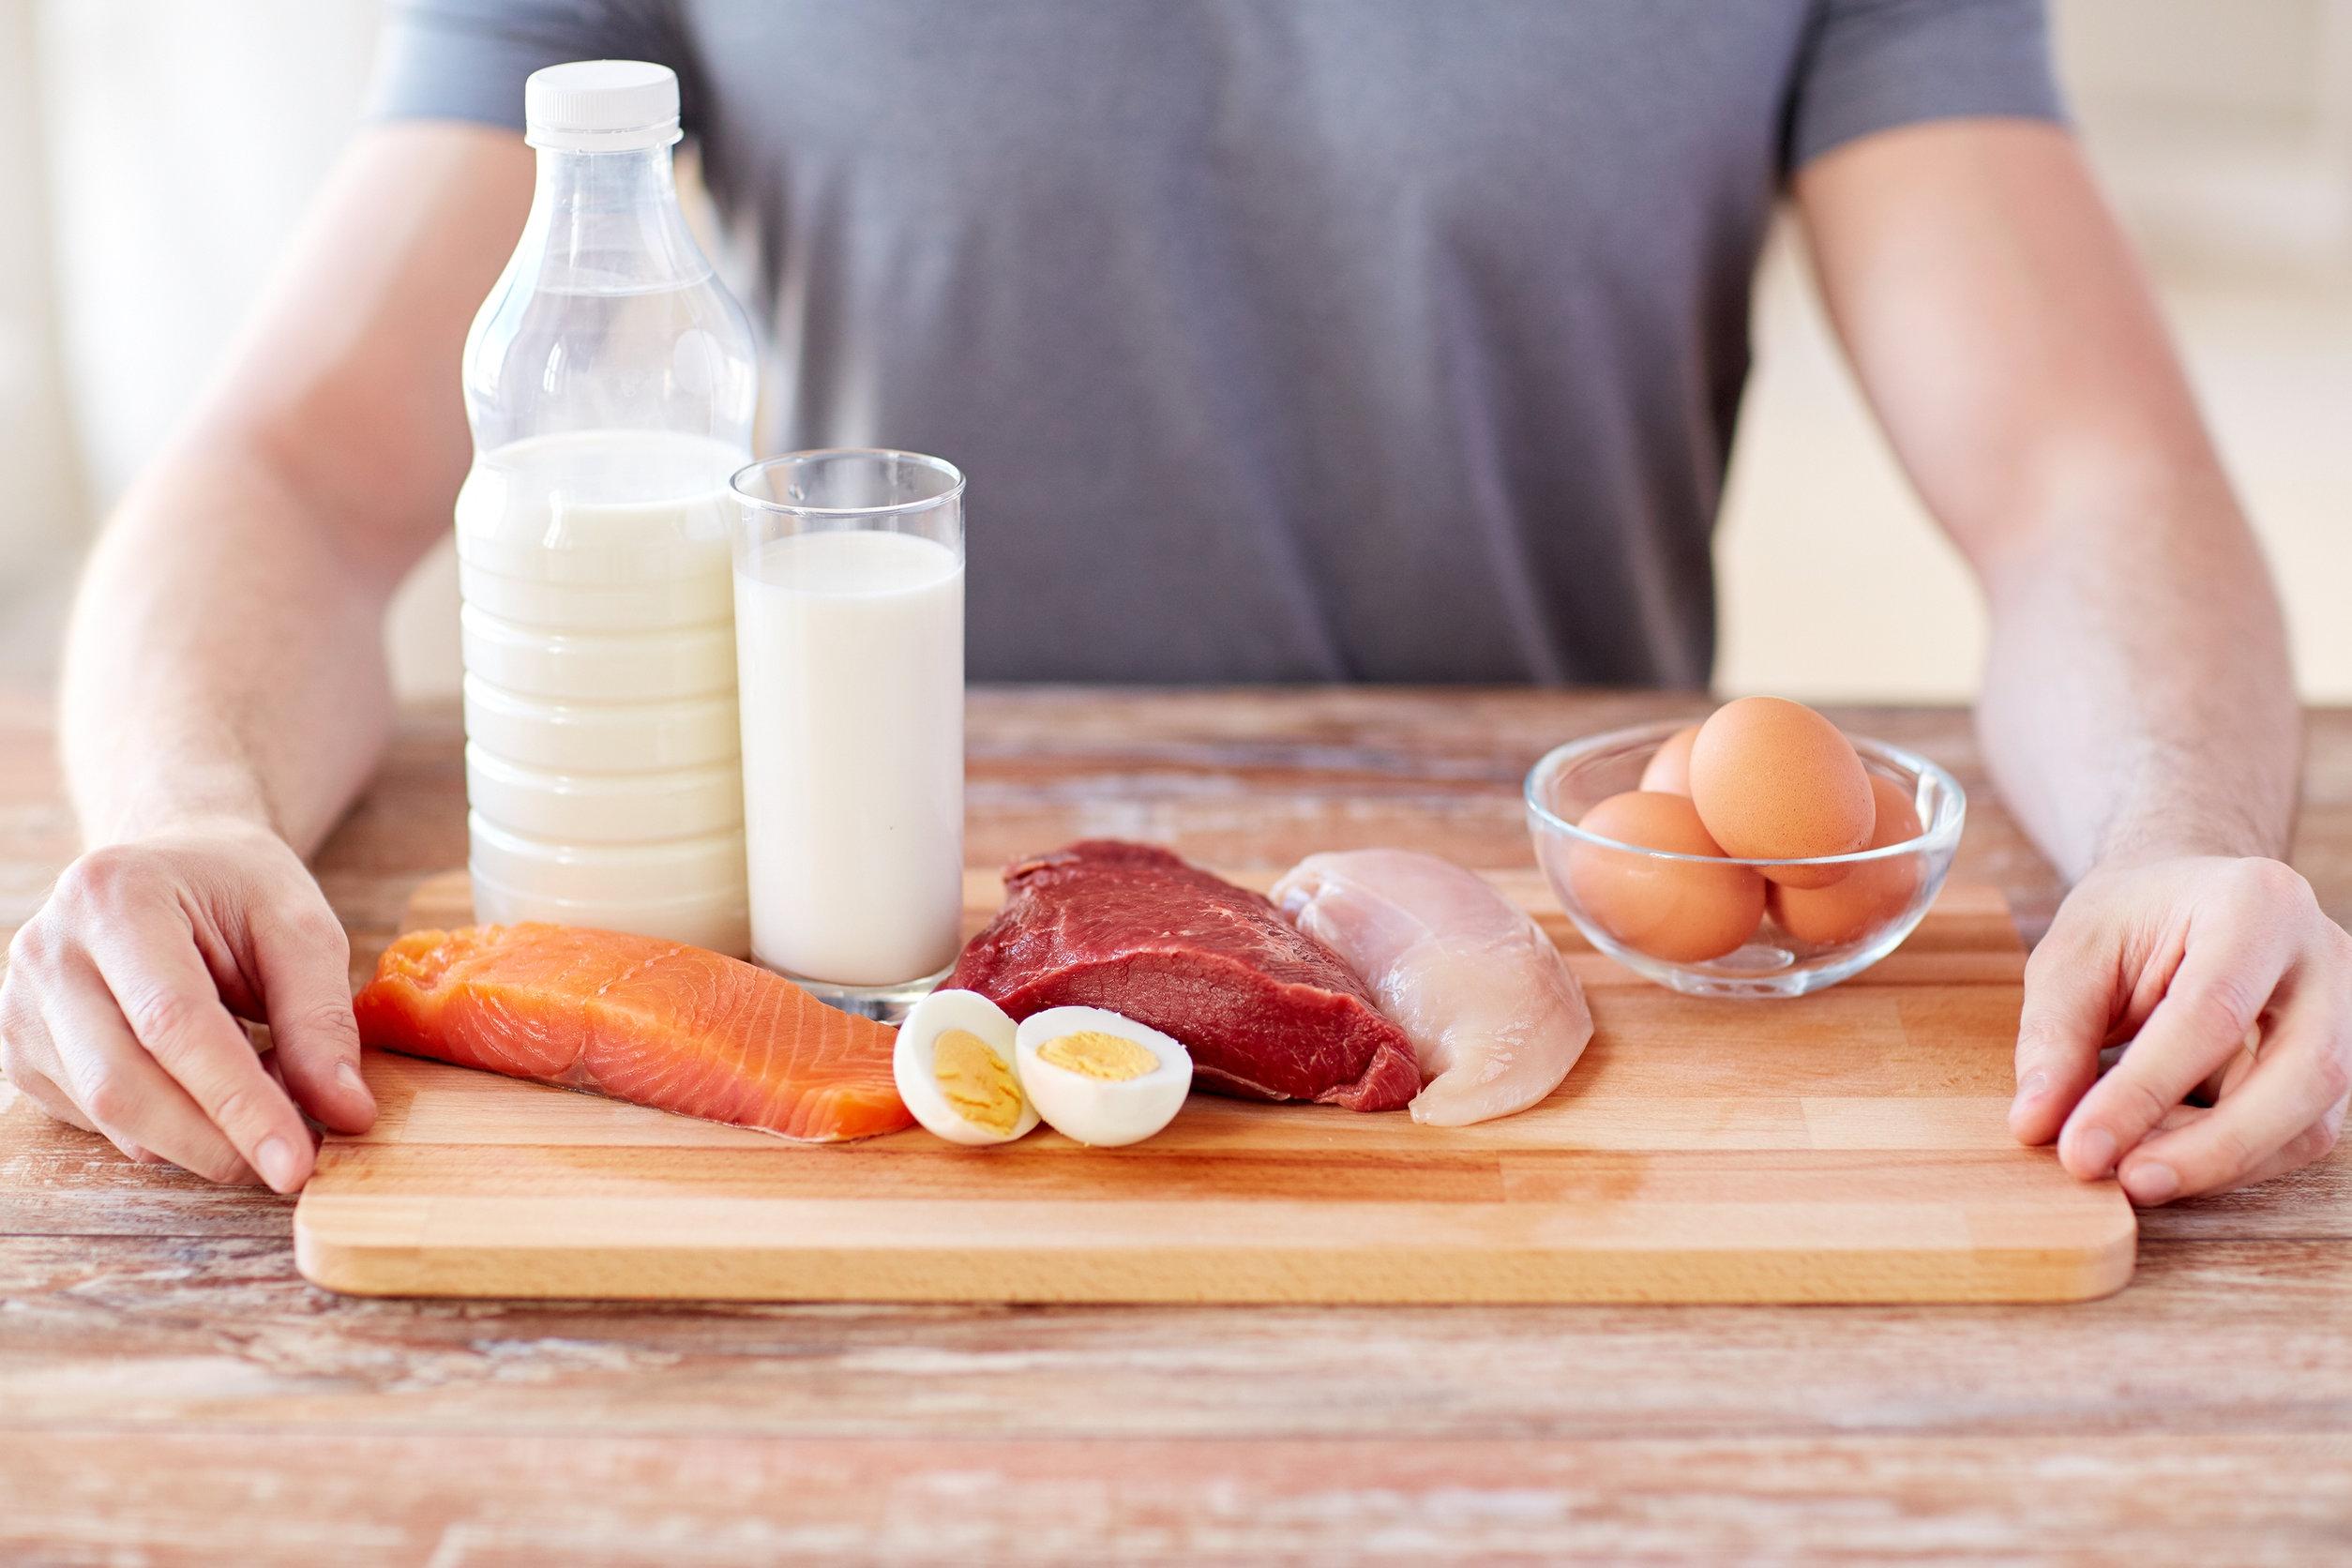 Imagen de grupo de alimentos saludables sobre mesa de madera